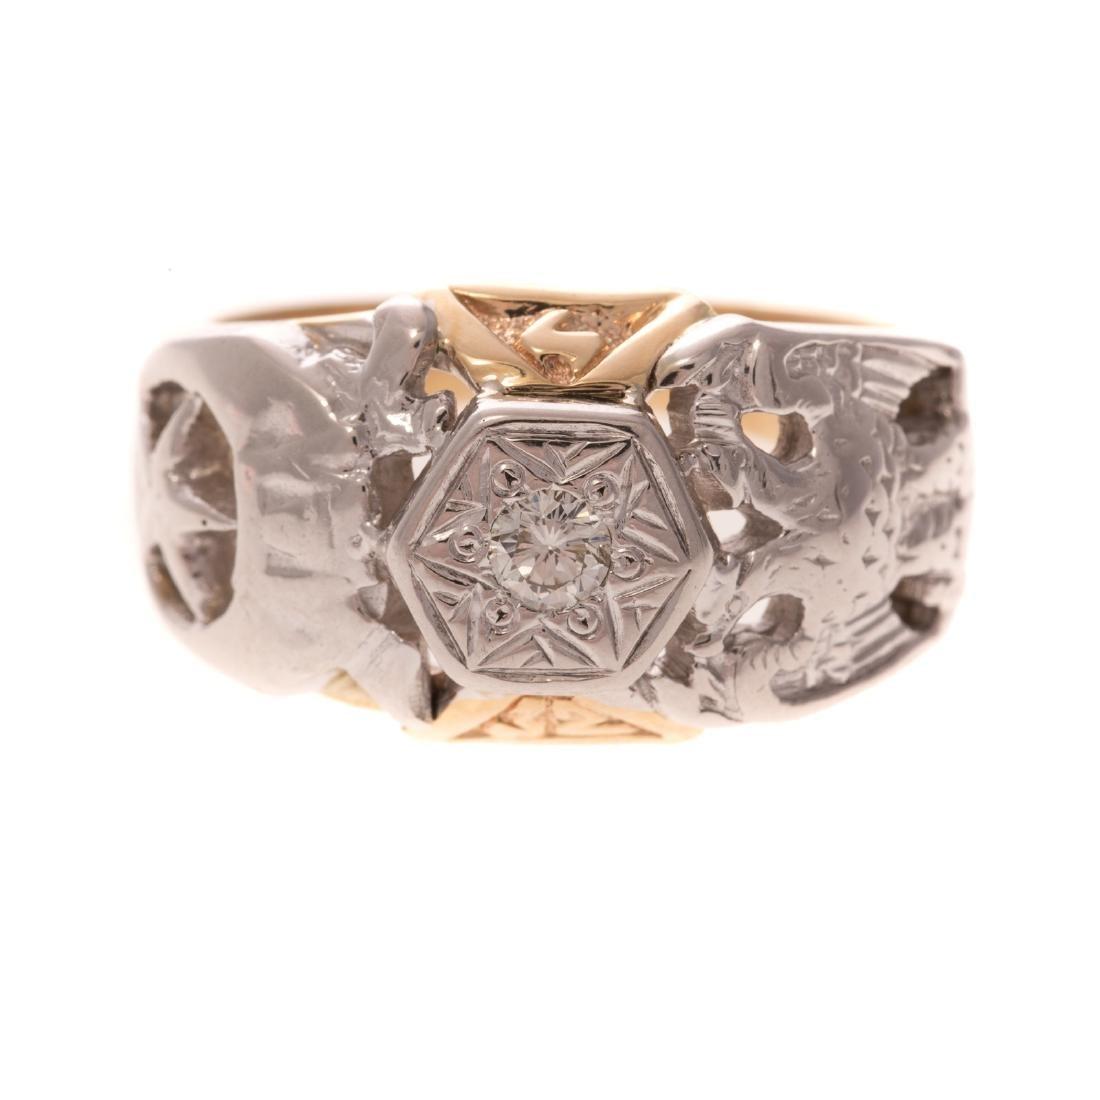 A Gentleman's Masonic Diamond Ring in 10K Gold